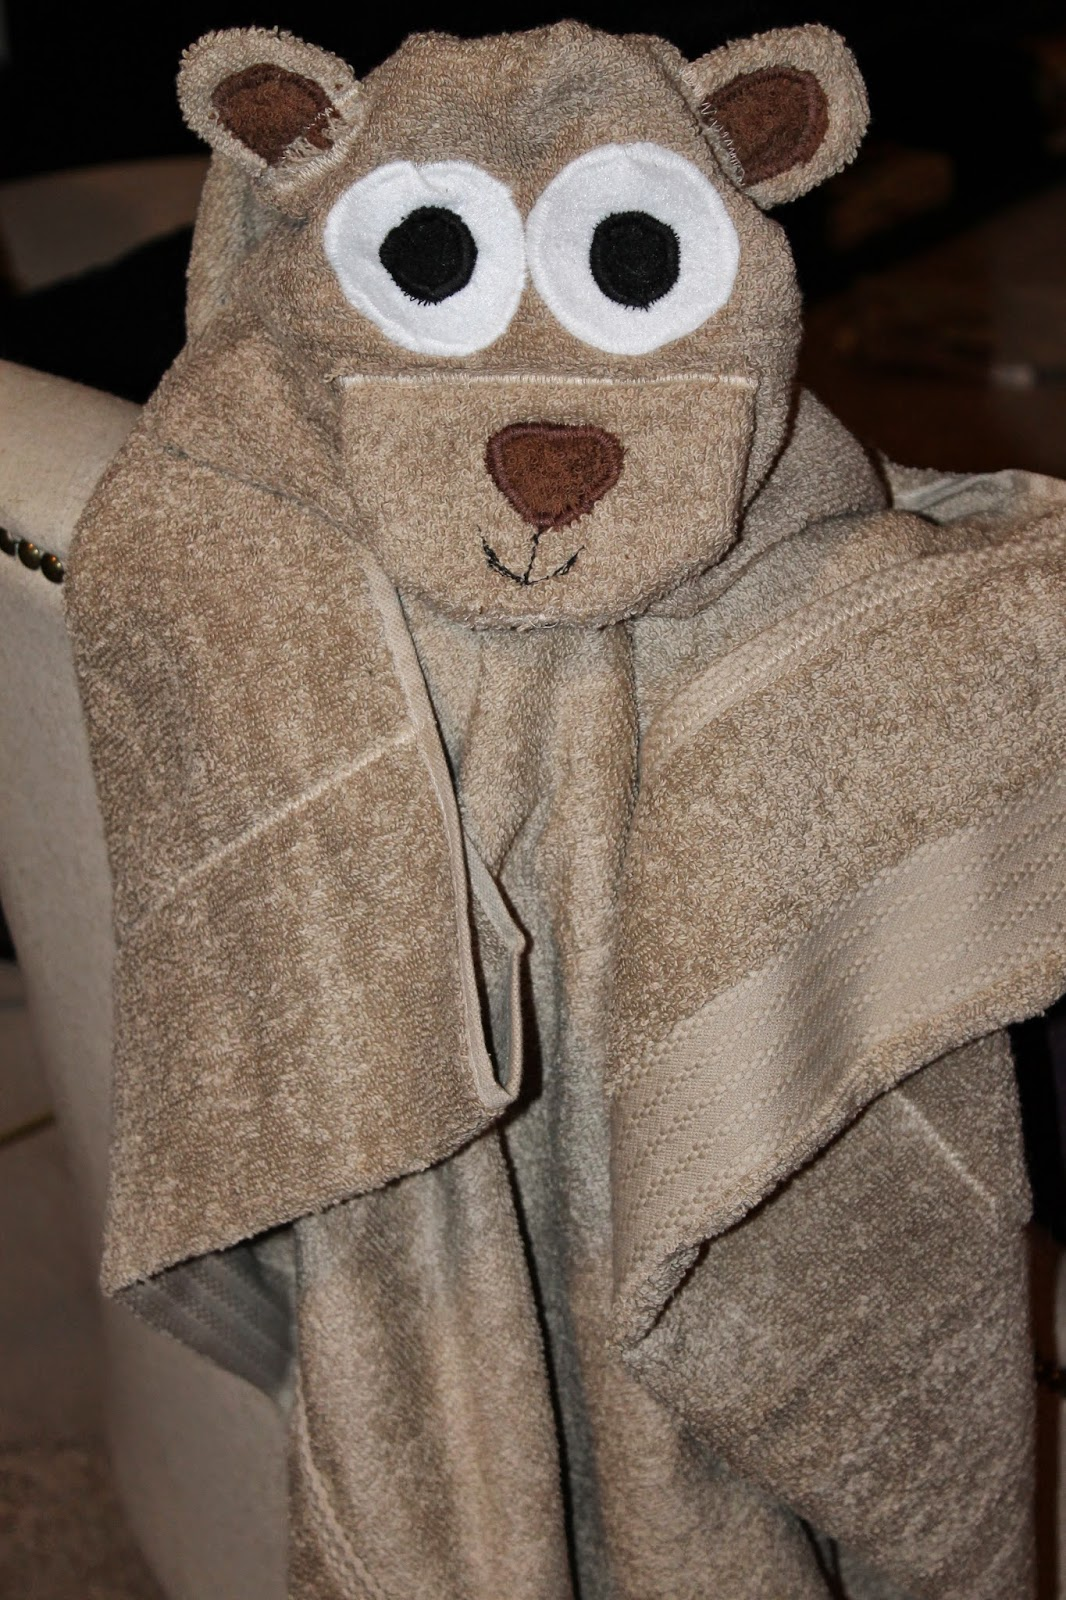 DIY hooded teddy bear towel, hooded bath towel